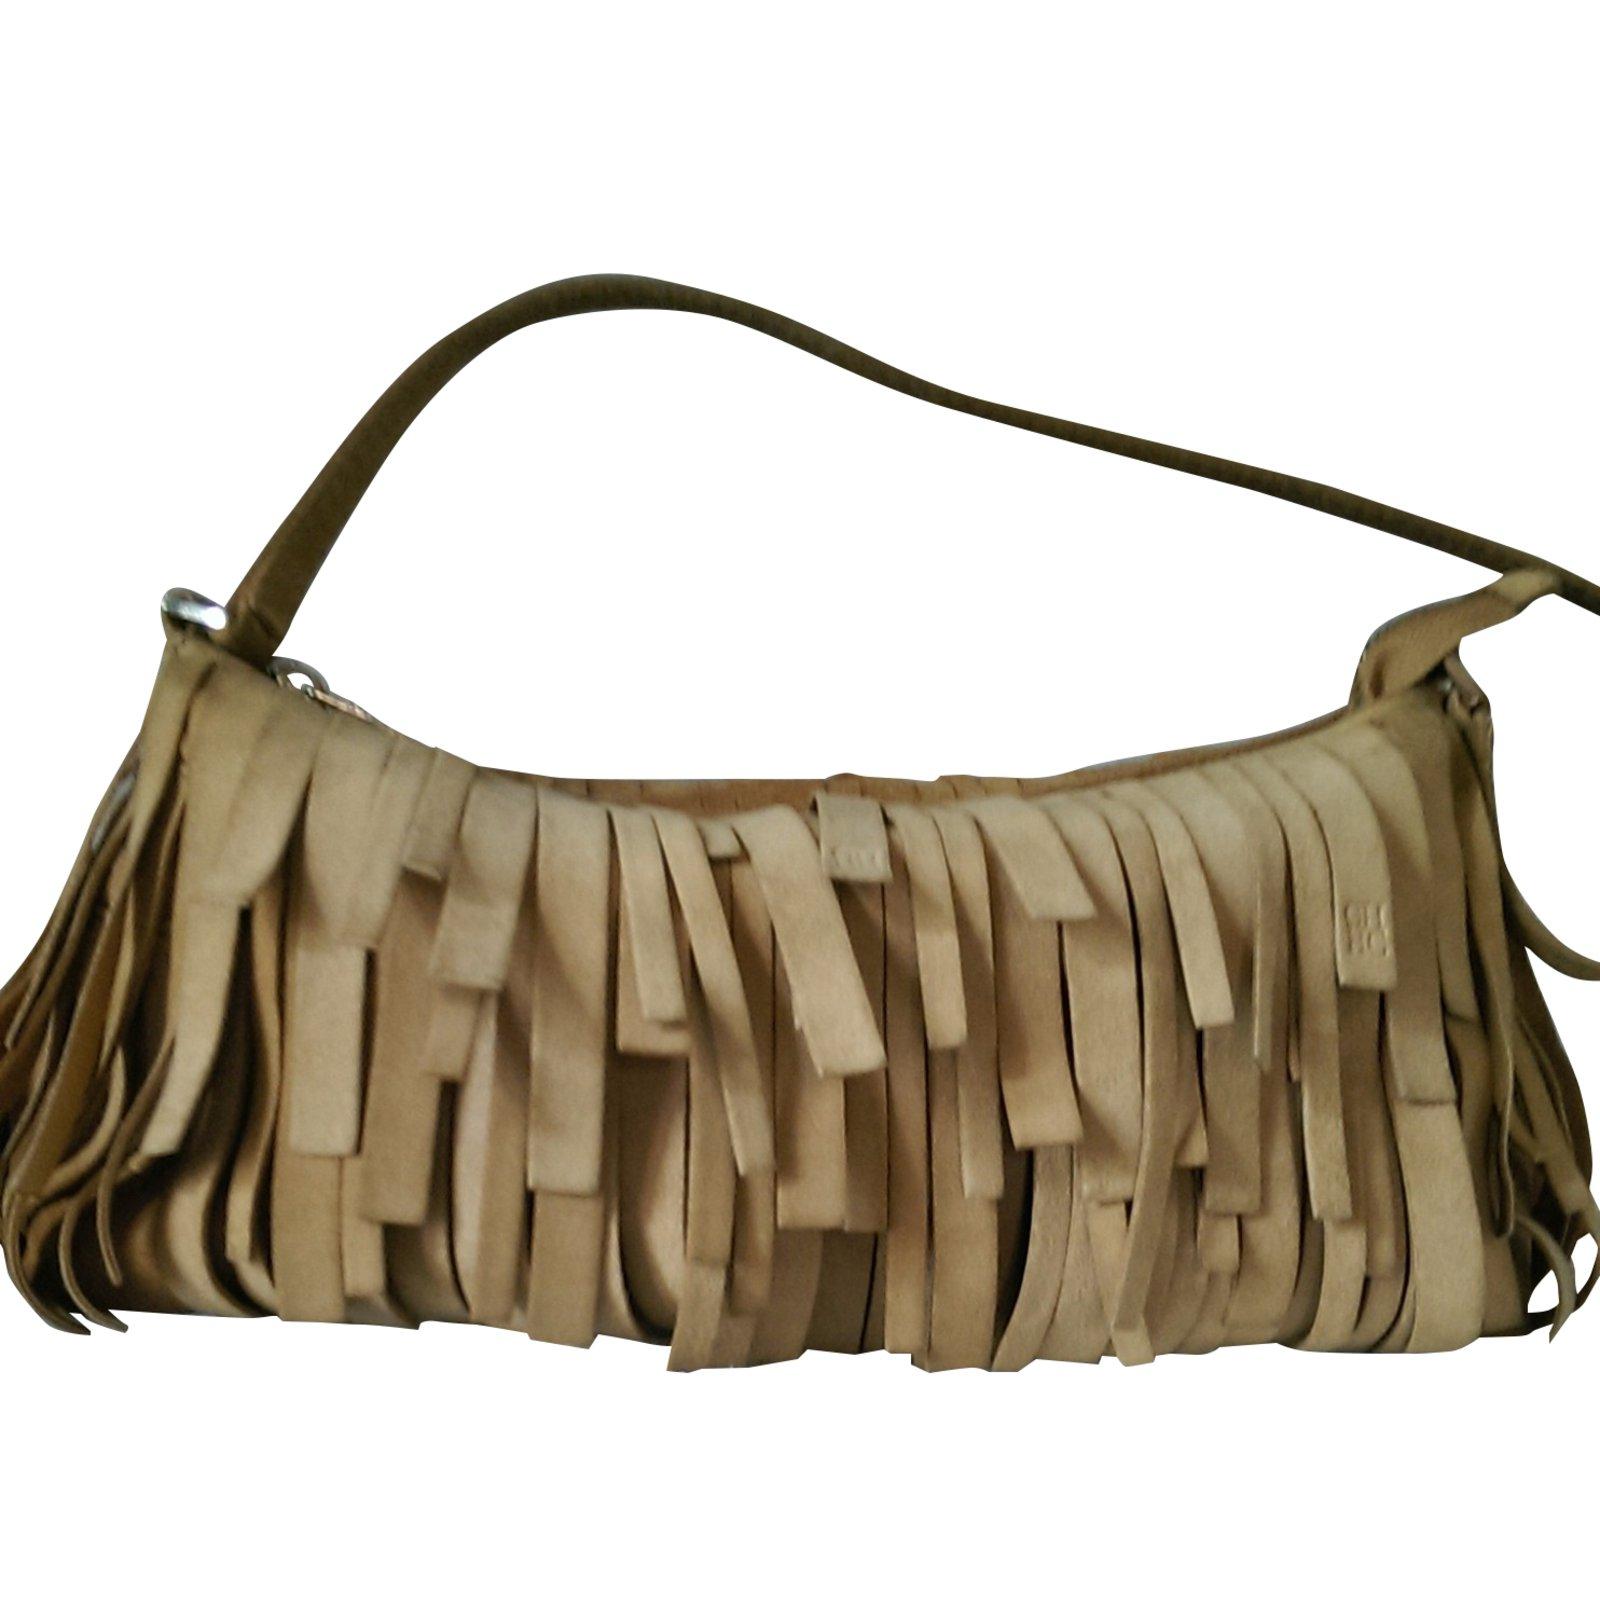 Carolina Herrera Handbag Handbags Deerskin Other ref.39454 - Joli Closet 590b34499dd65